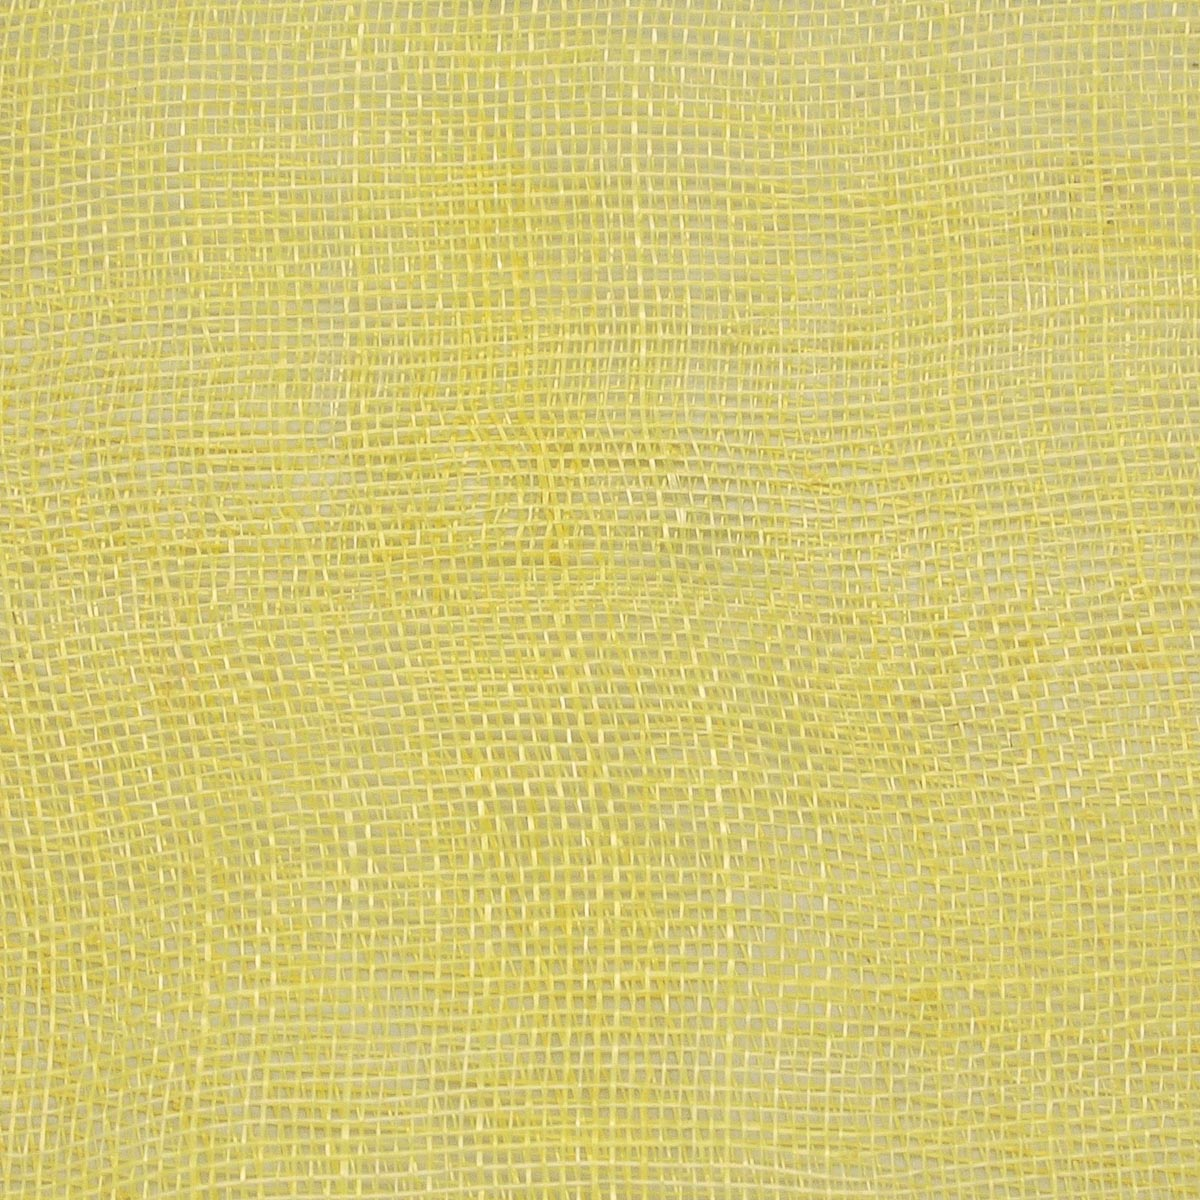 Light Yellow Medium Stiff Machine Weave Sinamay Fabric-SH001M-MS-004- Sun  Yorkos  8e335c257c0